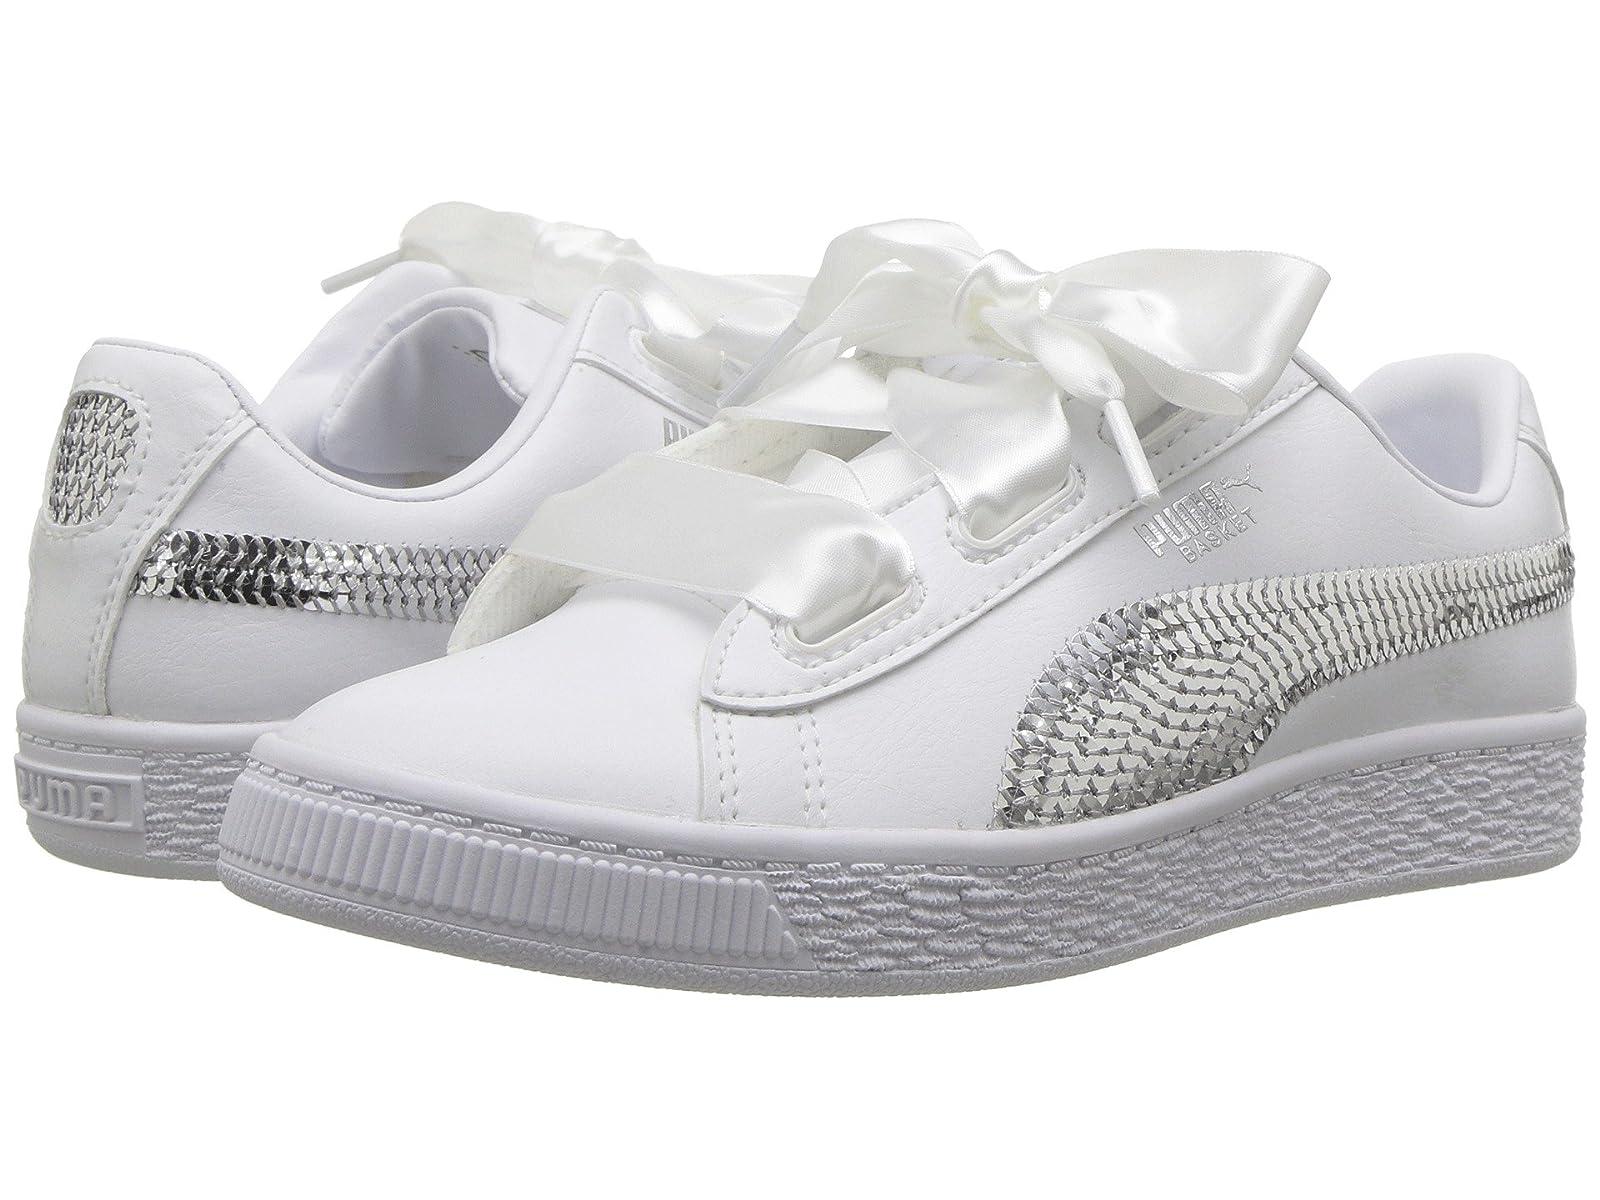 Puma Kids Basket Heart Bling PS (Little Kid)Atmospheric grades have affordable shoes